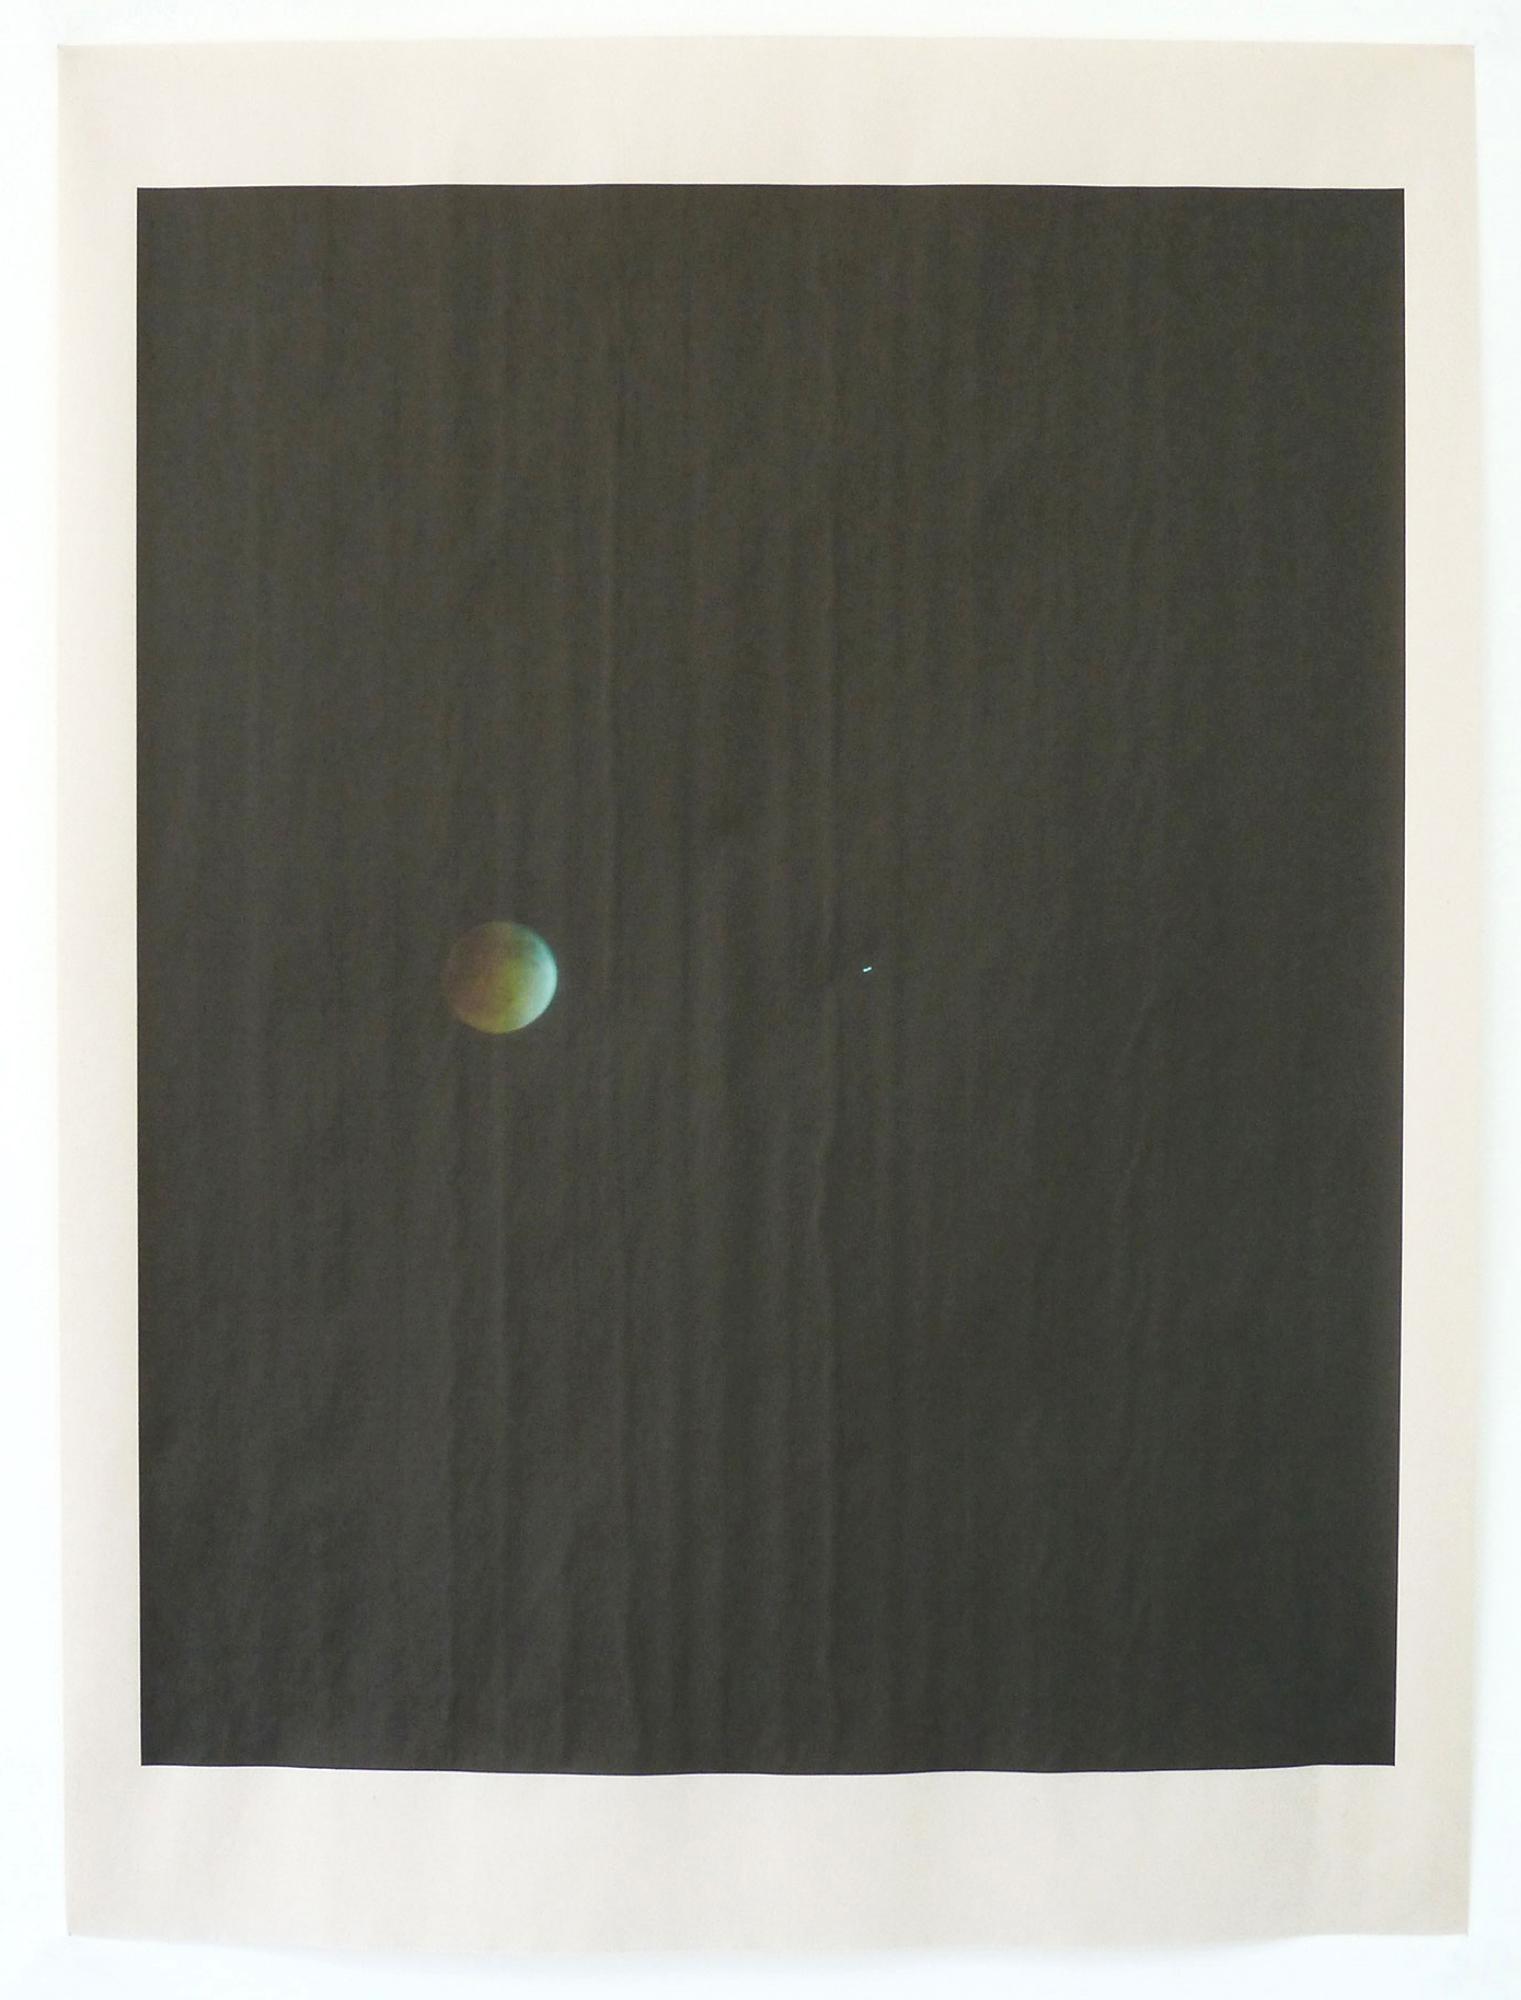 LA_12391 , unique pigment print on newsprint, 18 x 24 inches, 2015